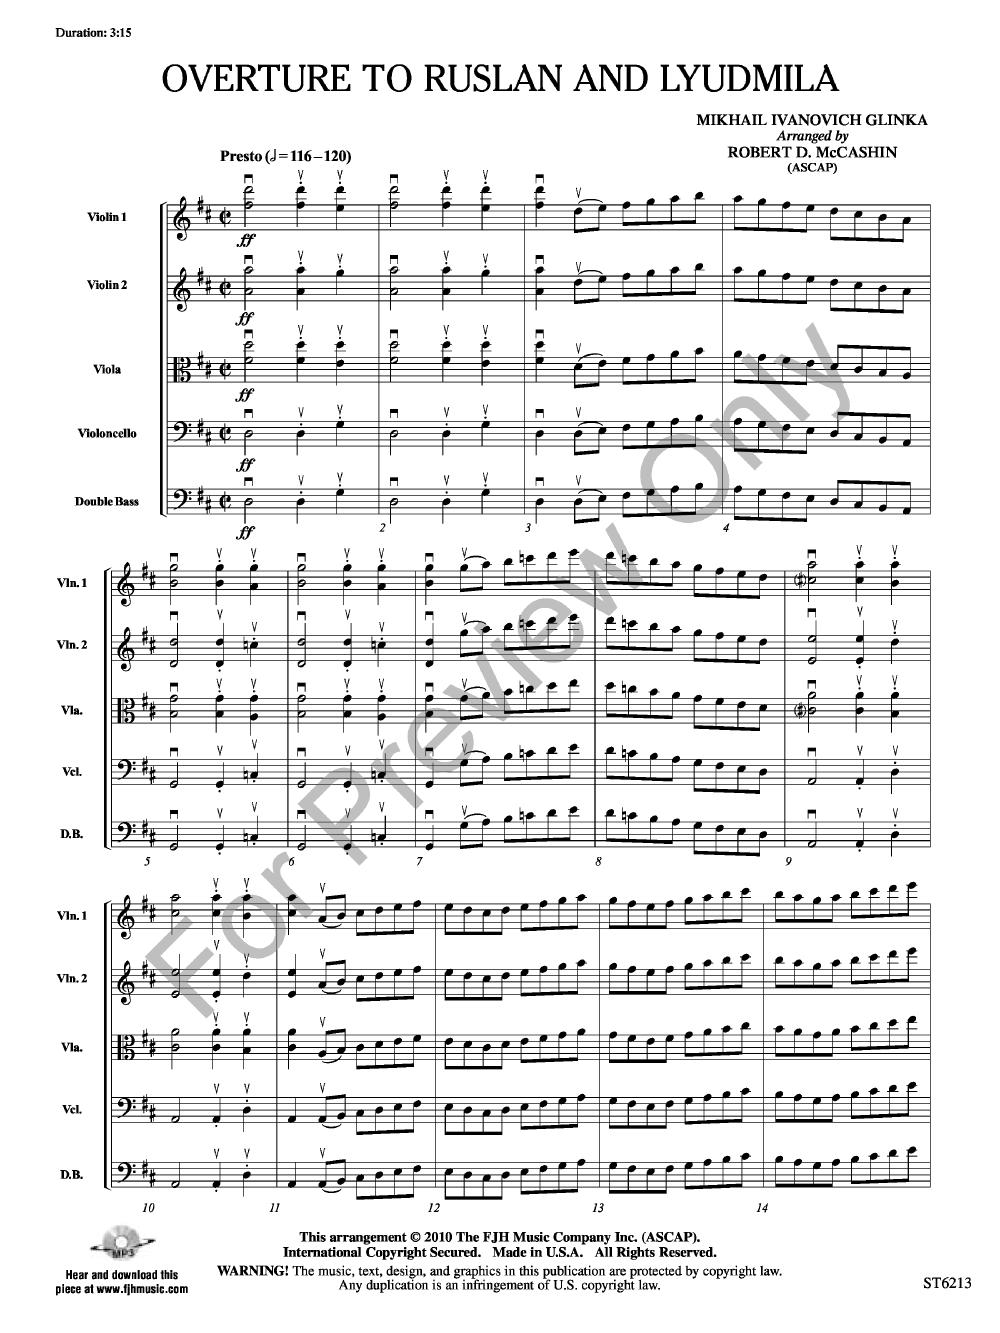 Ruslan and Lyudmila.  1. Overture